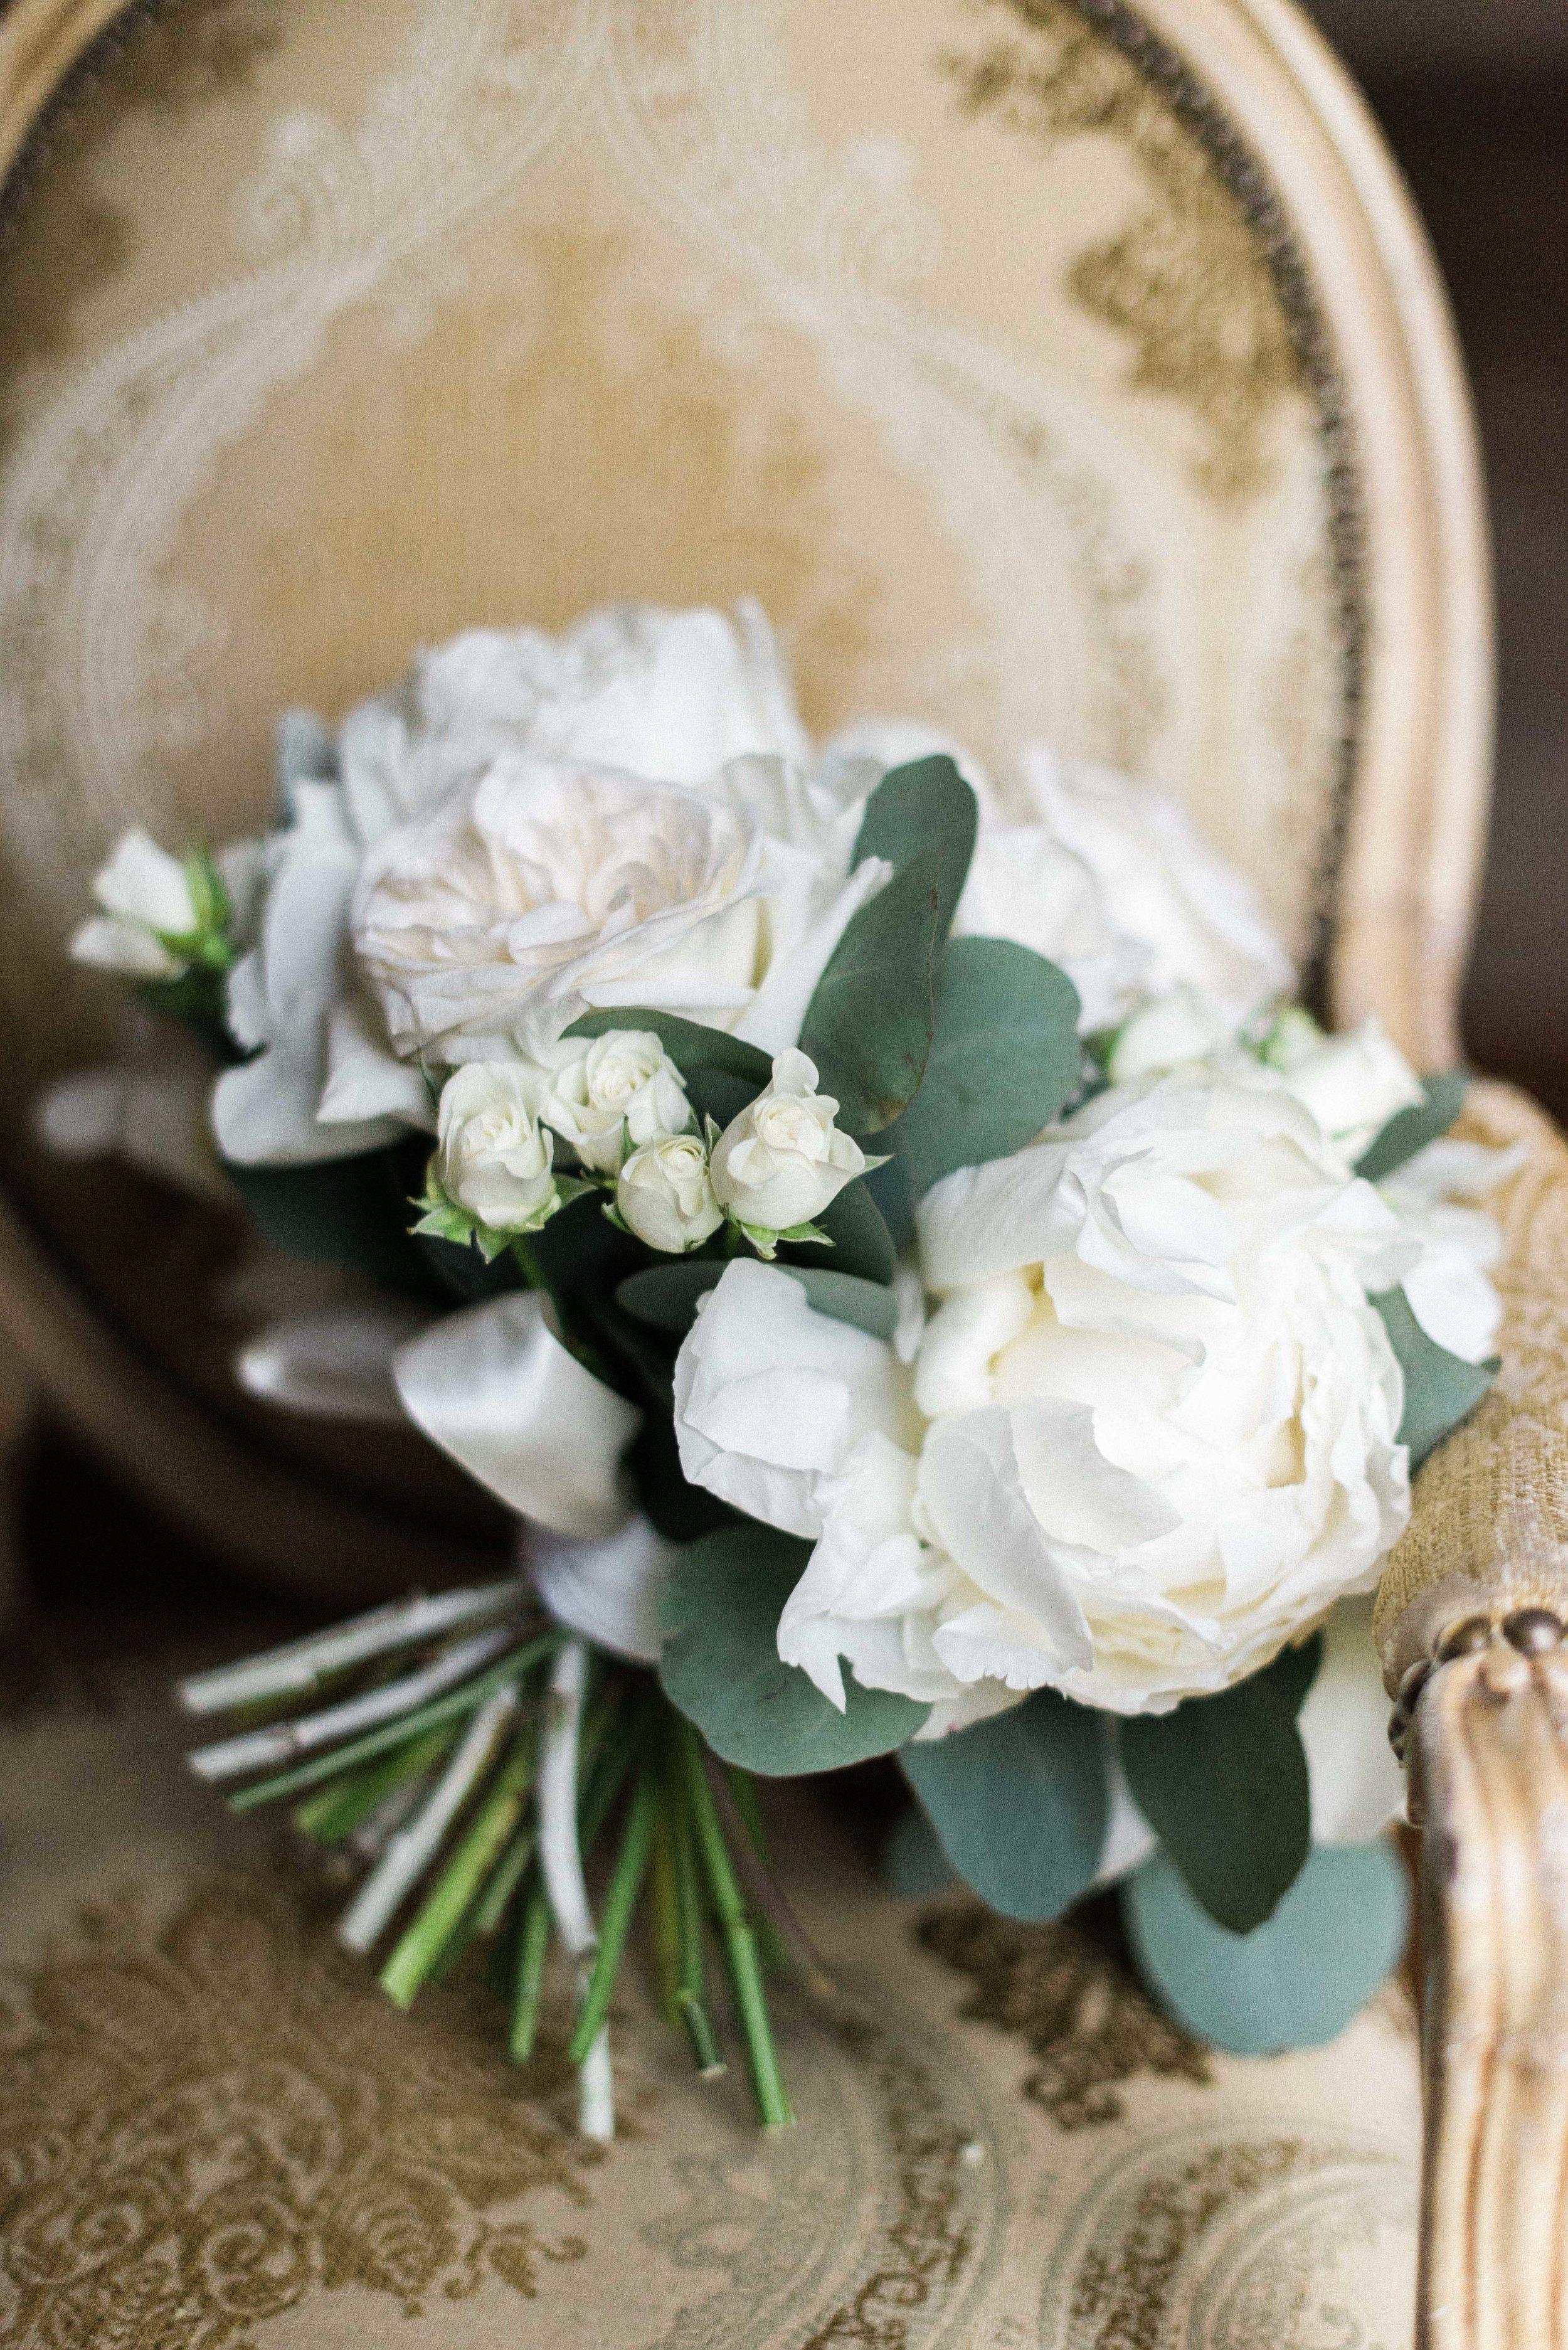 houston-wedding-planner-fine-art-luxury-designer-top-best-destination-austin-dallas-kelly-doonan-events-river-oaks-country-club-16